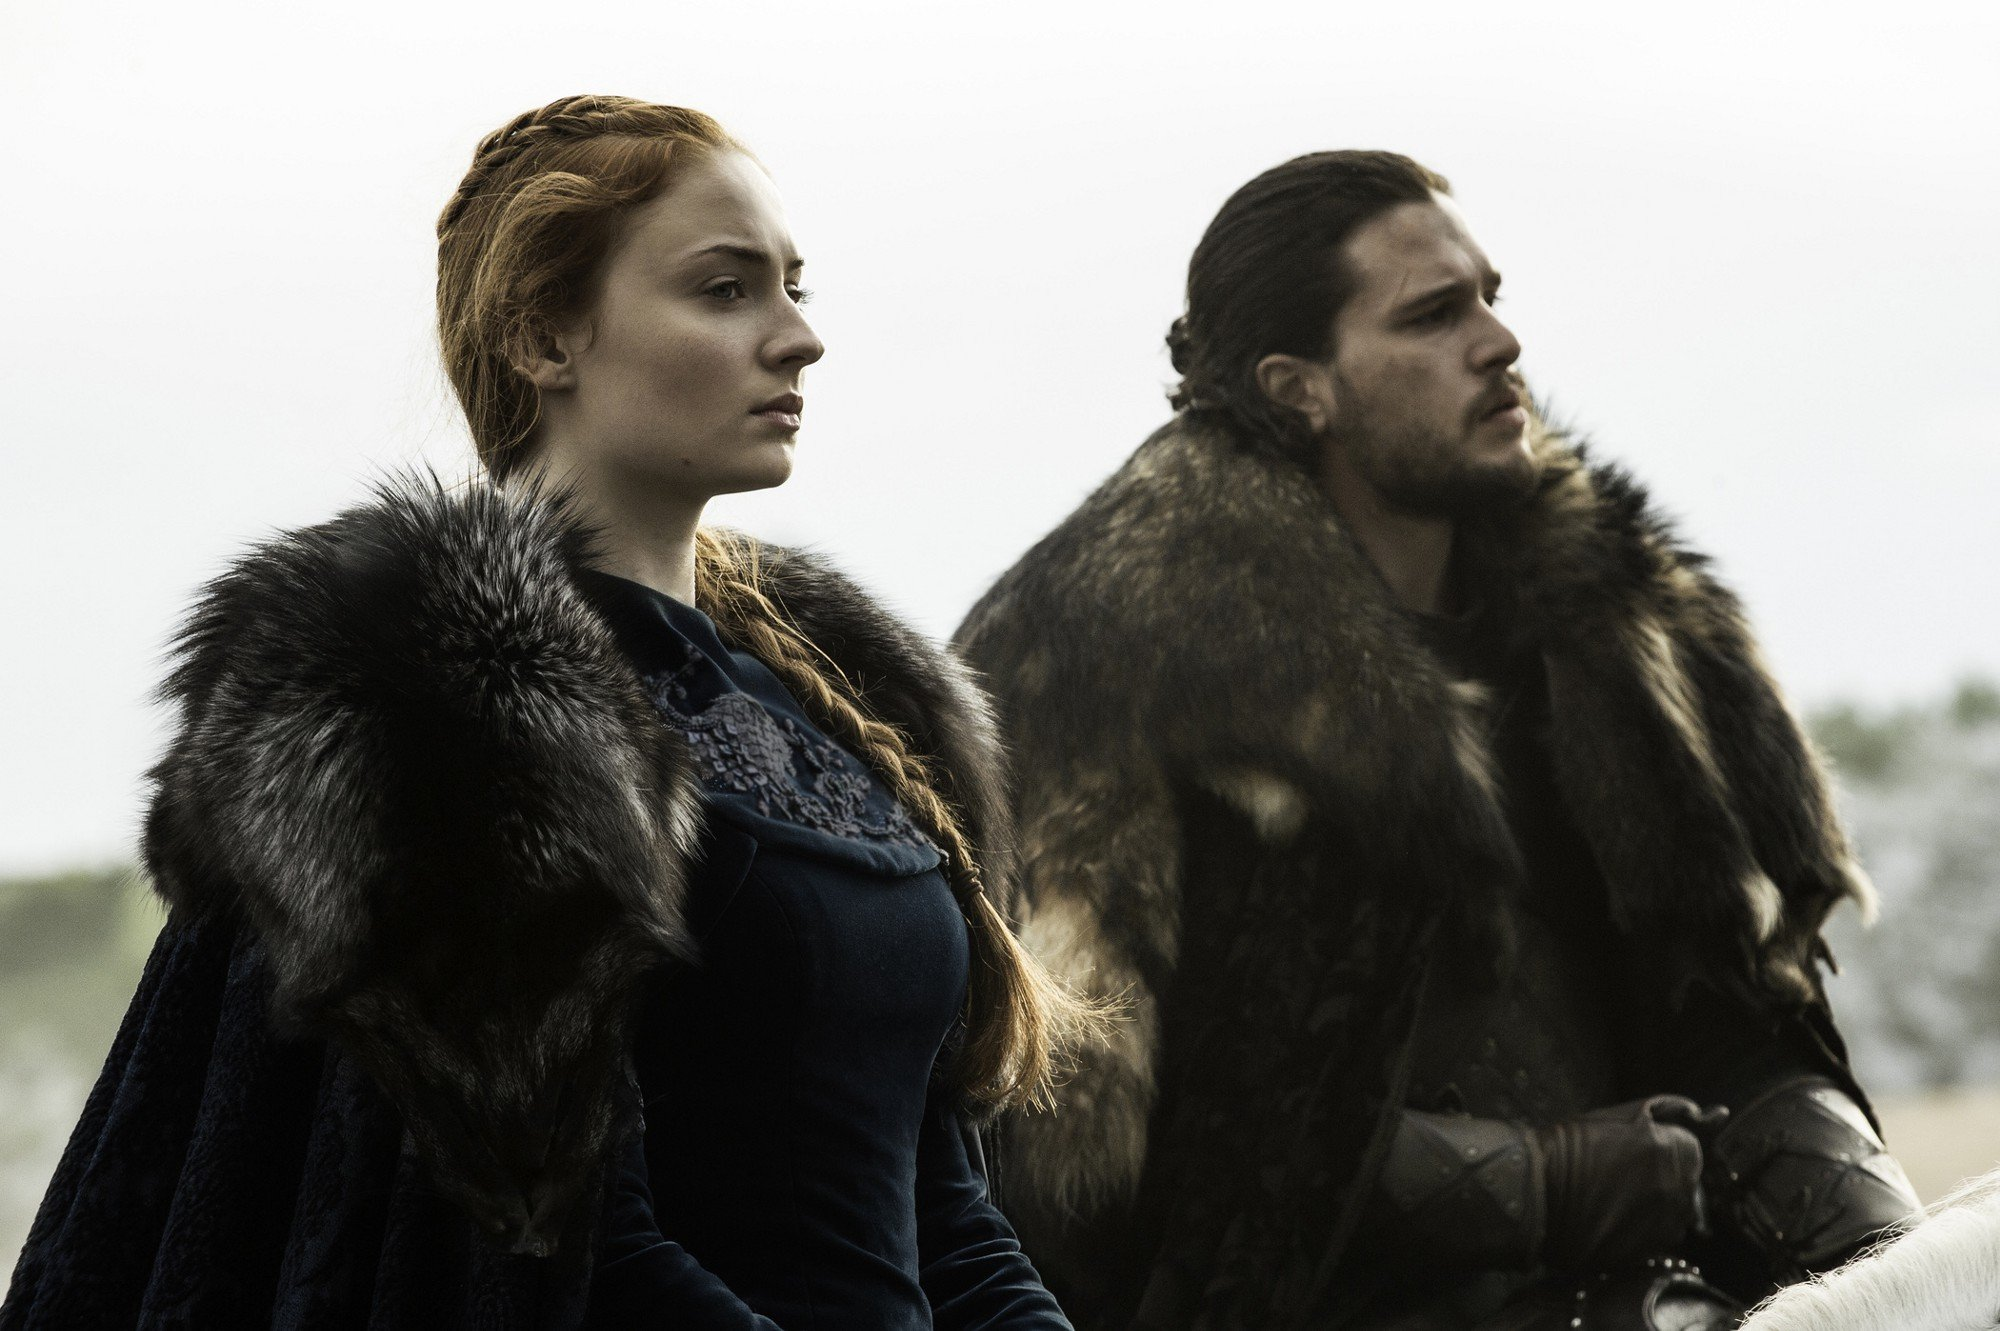 Game of Thrones Sansa Stark Sophie Turner Jon Snow Kit Harington